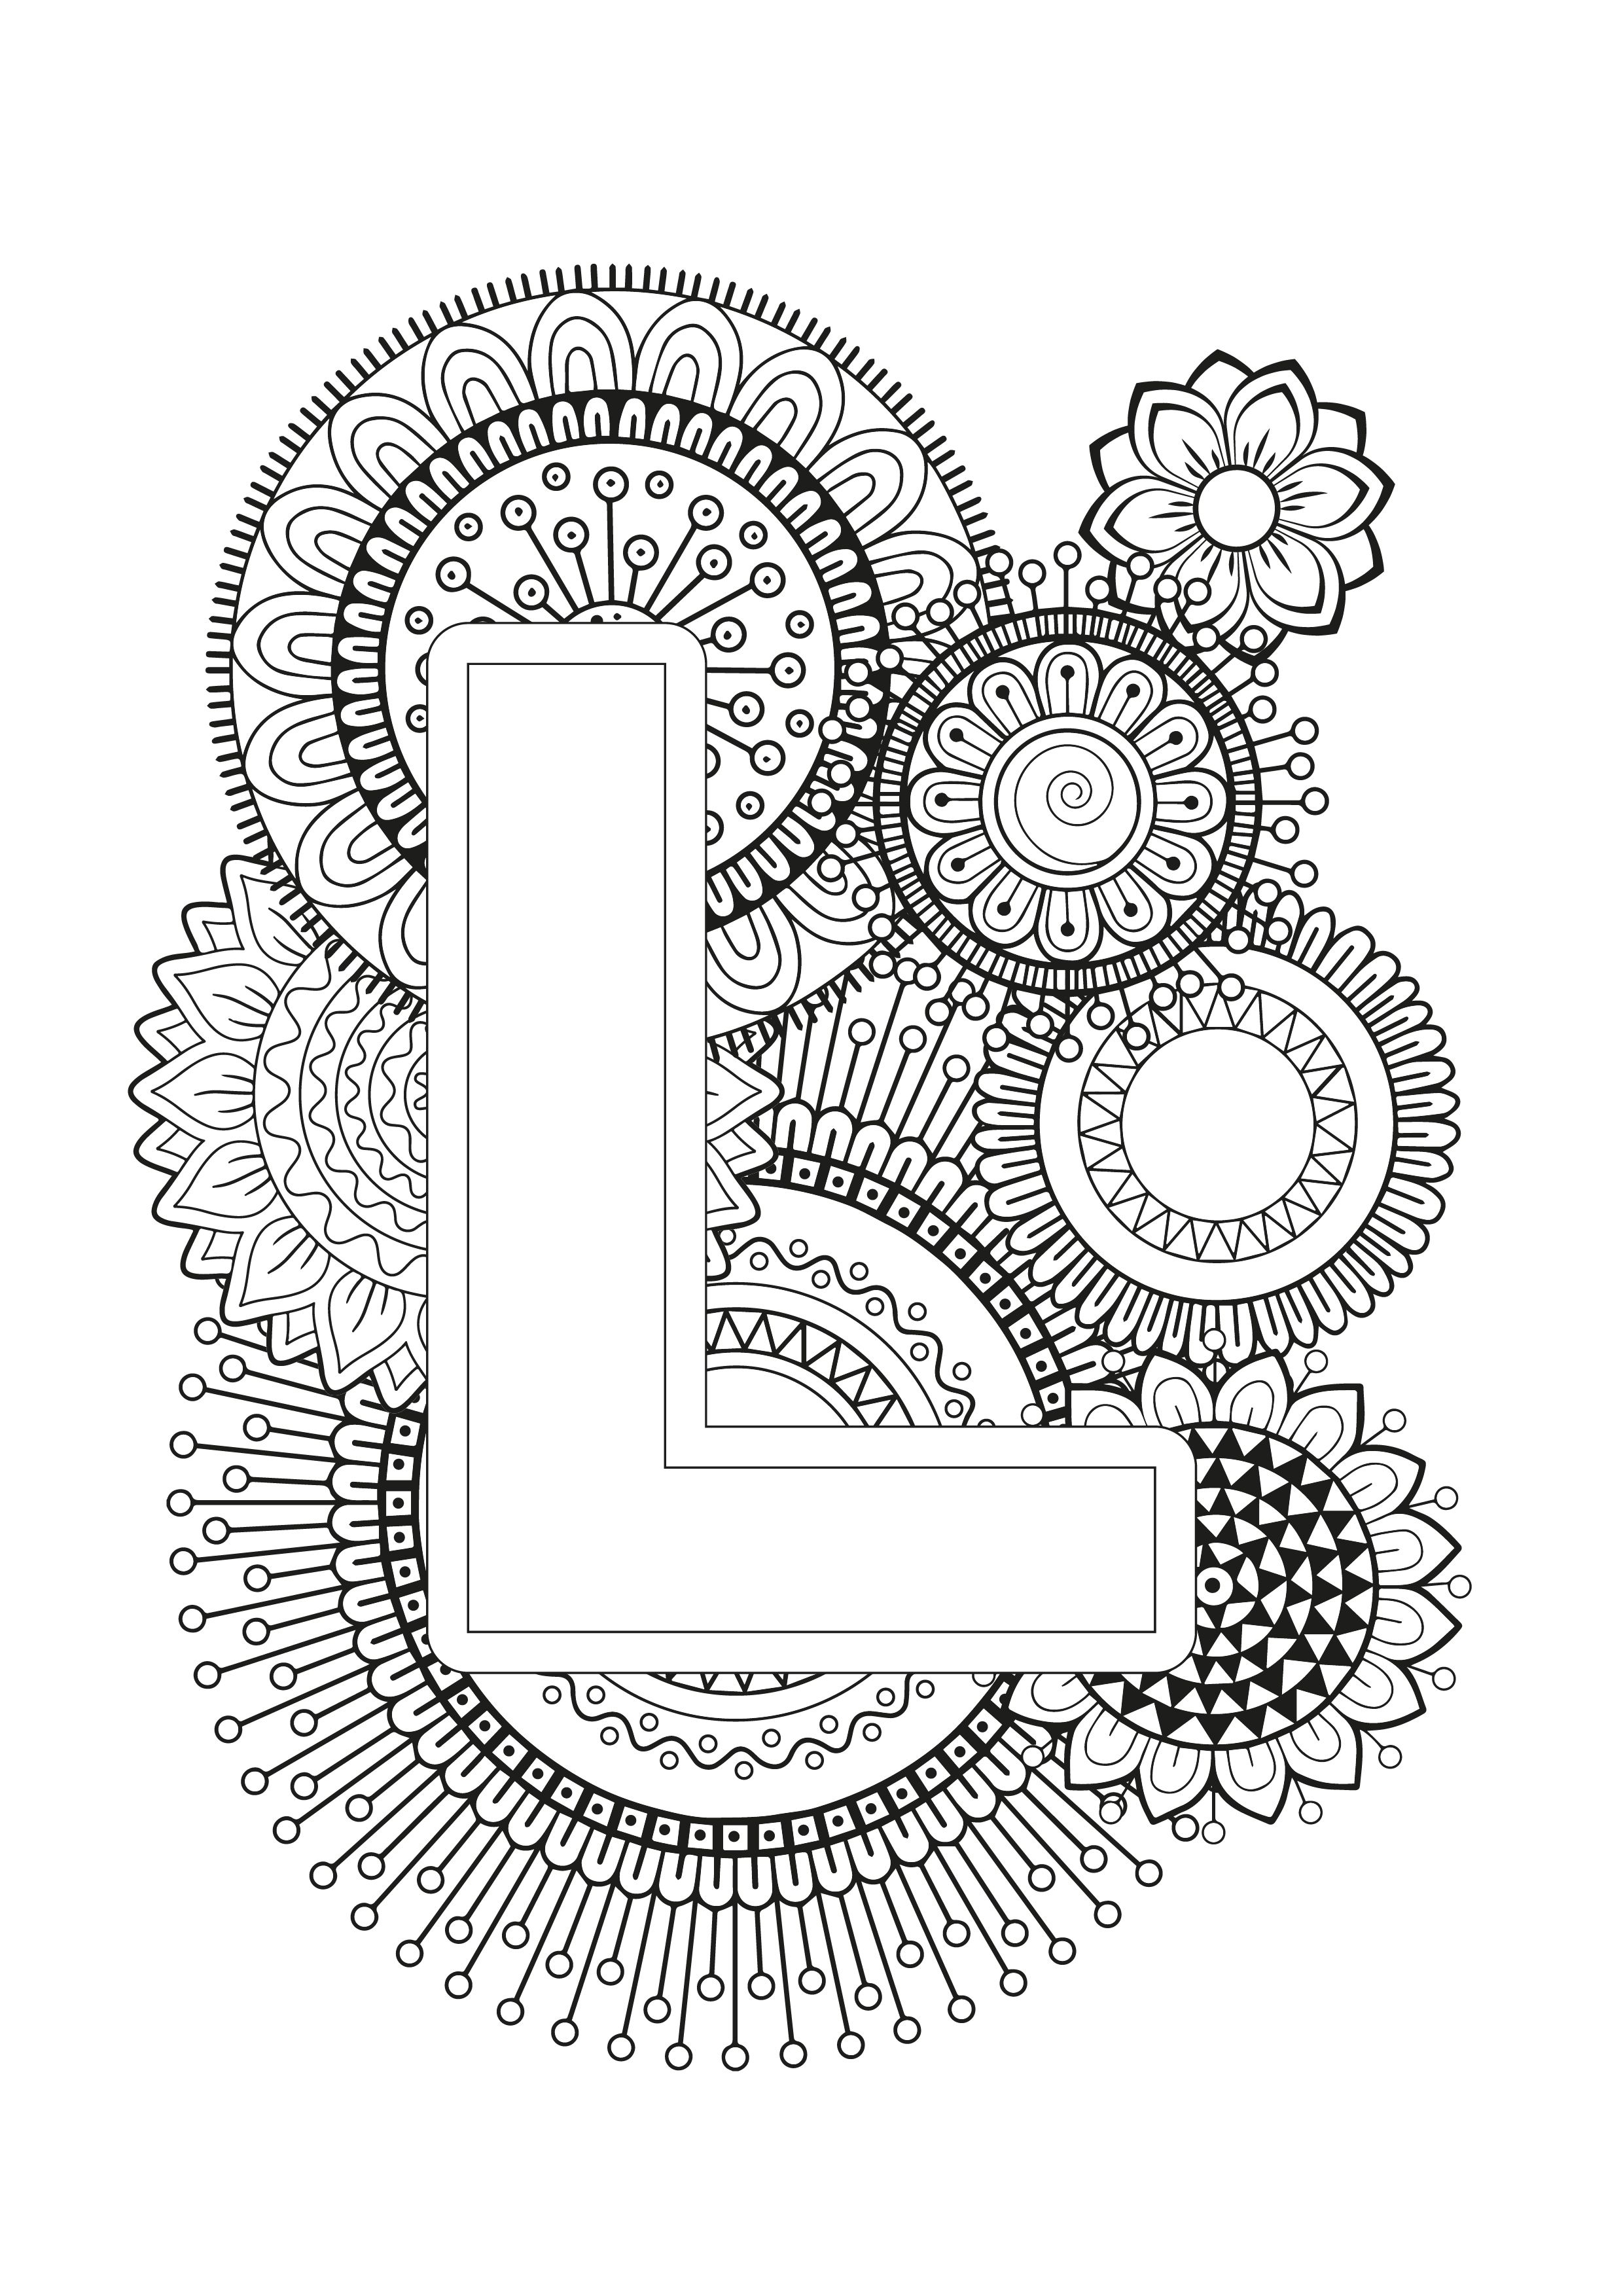 Mindfulness Coloring Page Alphabet Mandala Coloring Pages Alphabet Coloring Pages Coloring Books